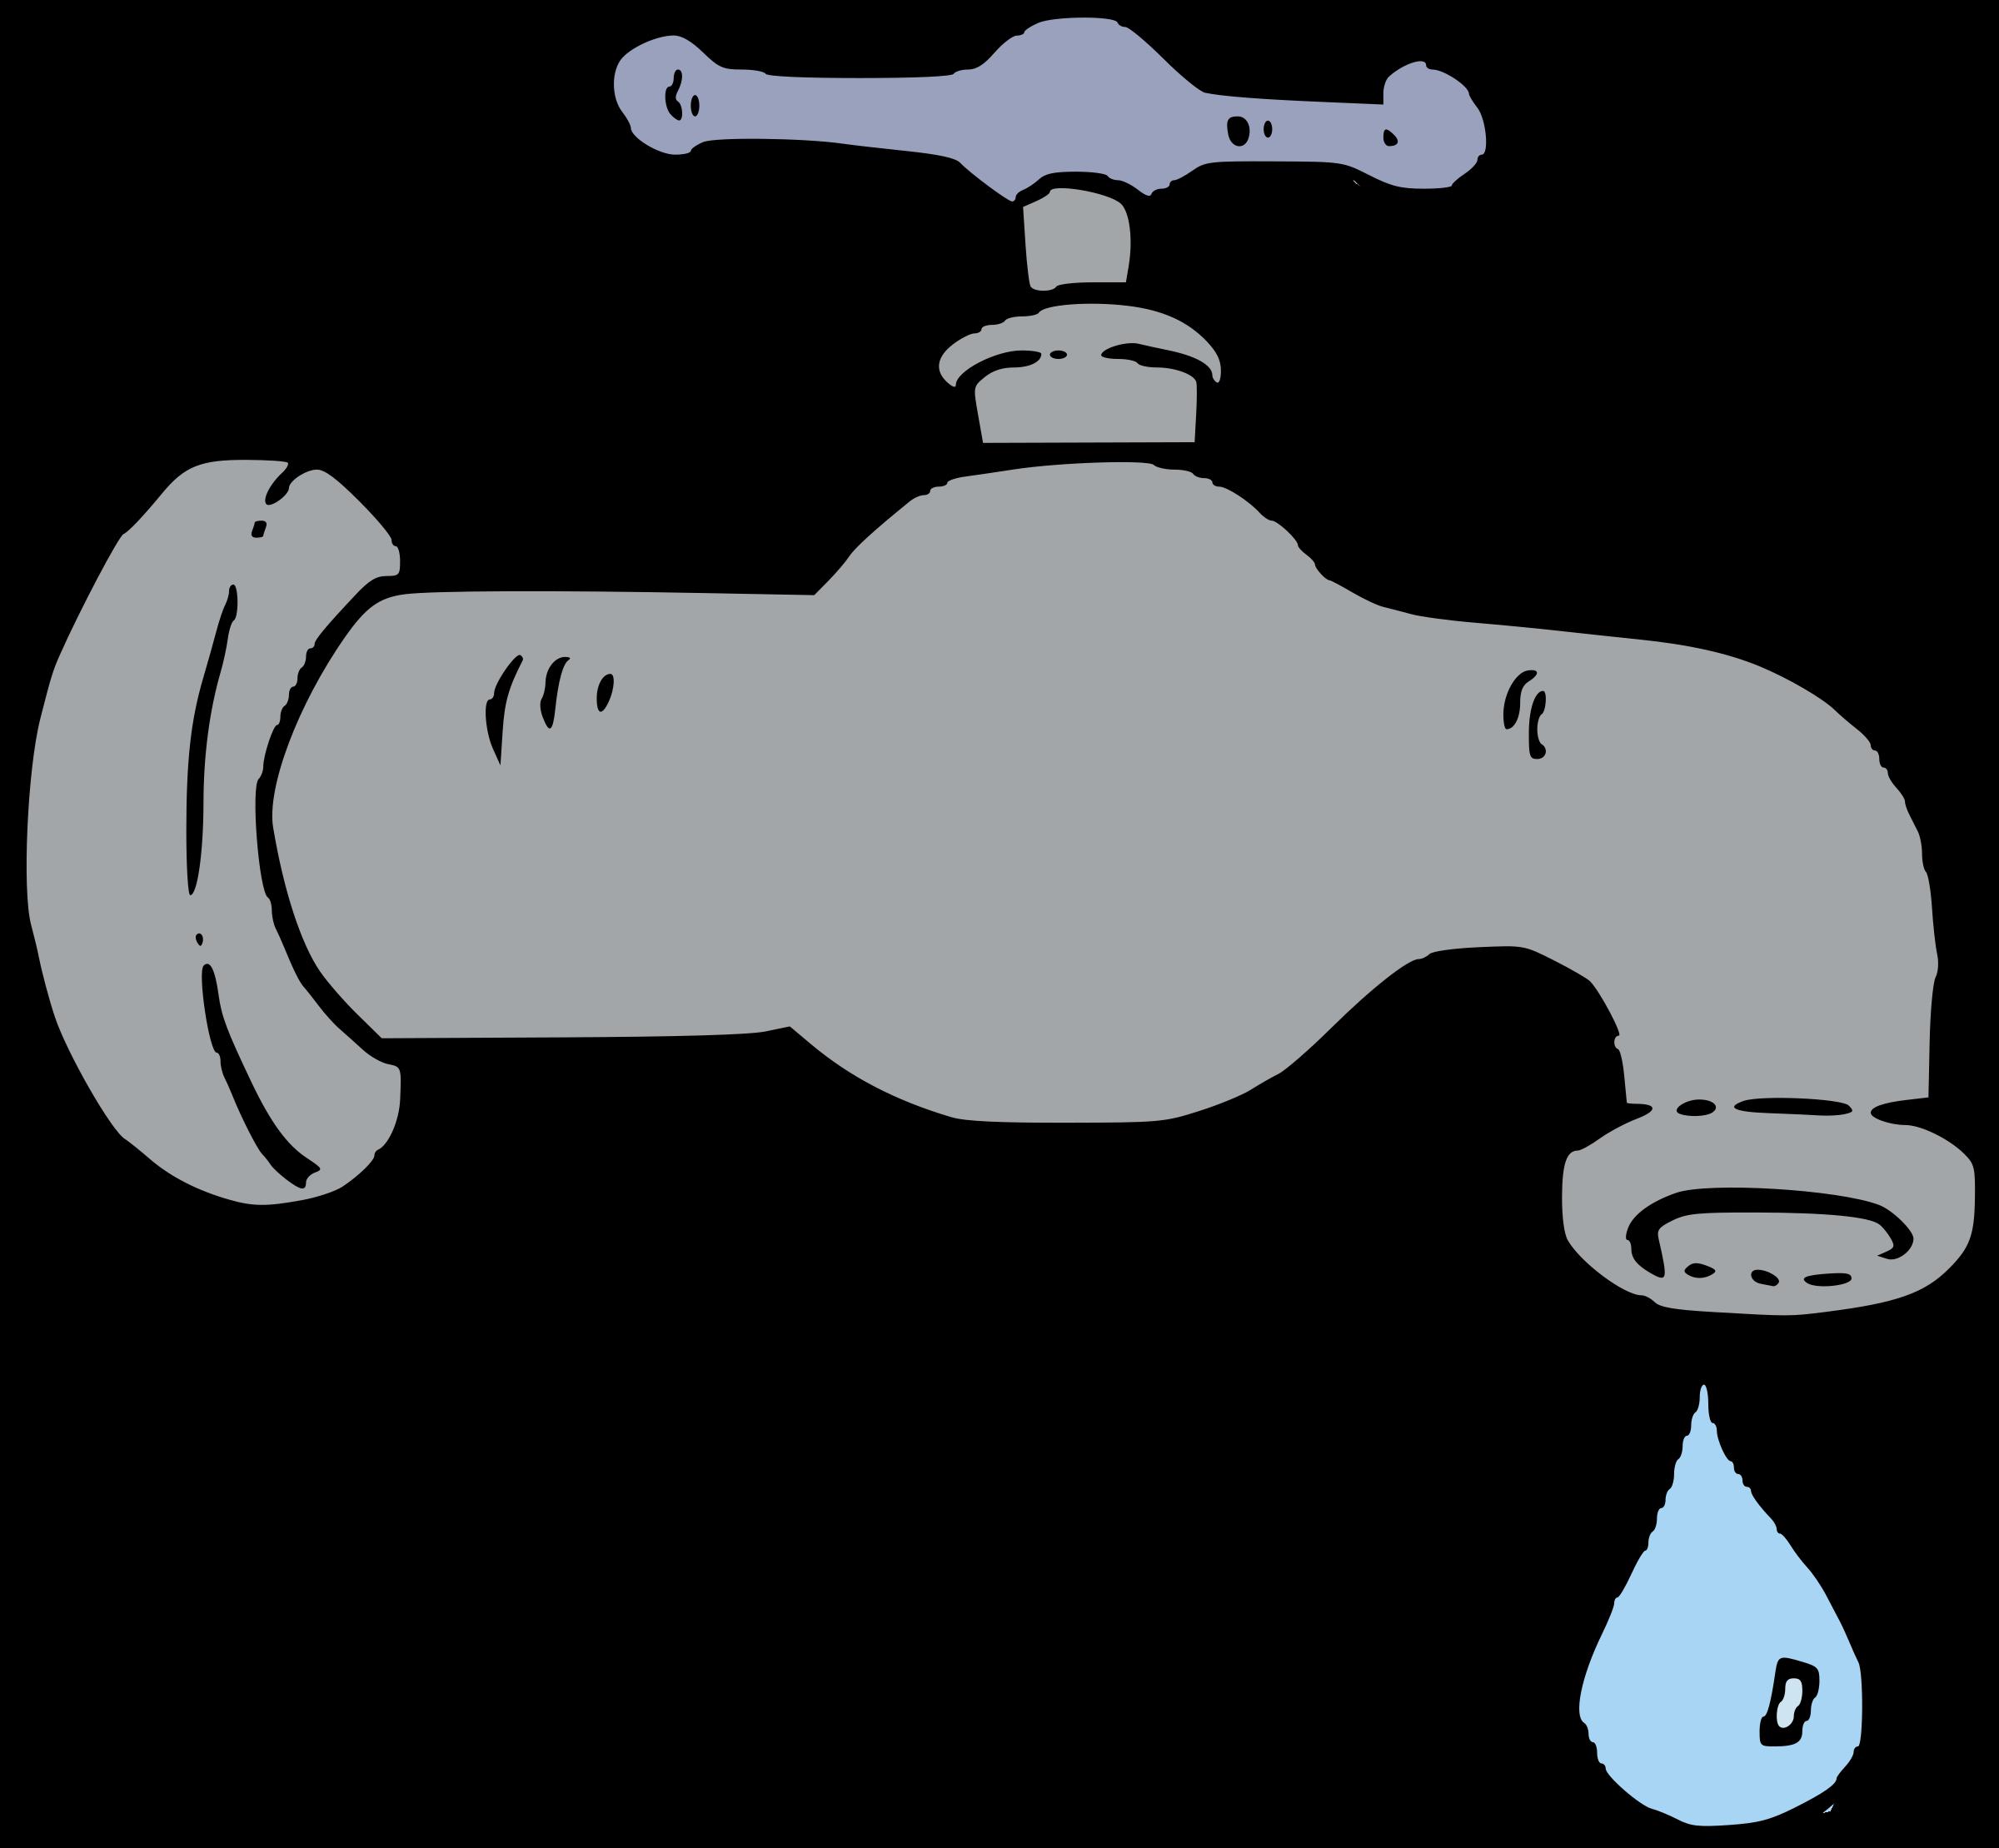 clipart water faucet. Black Bedroom Furniture Sets. Home Design Ideas